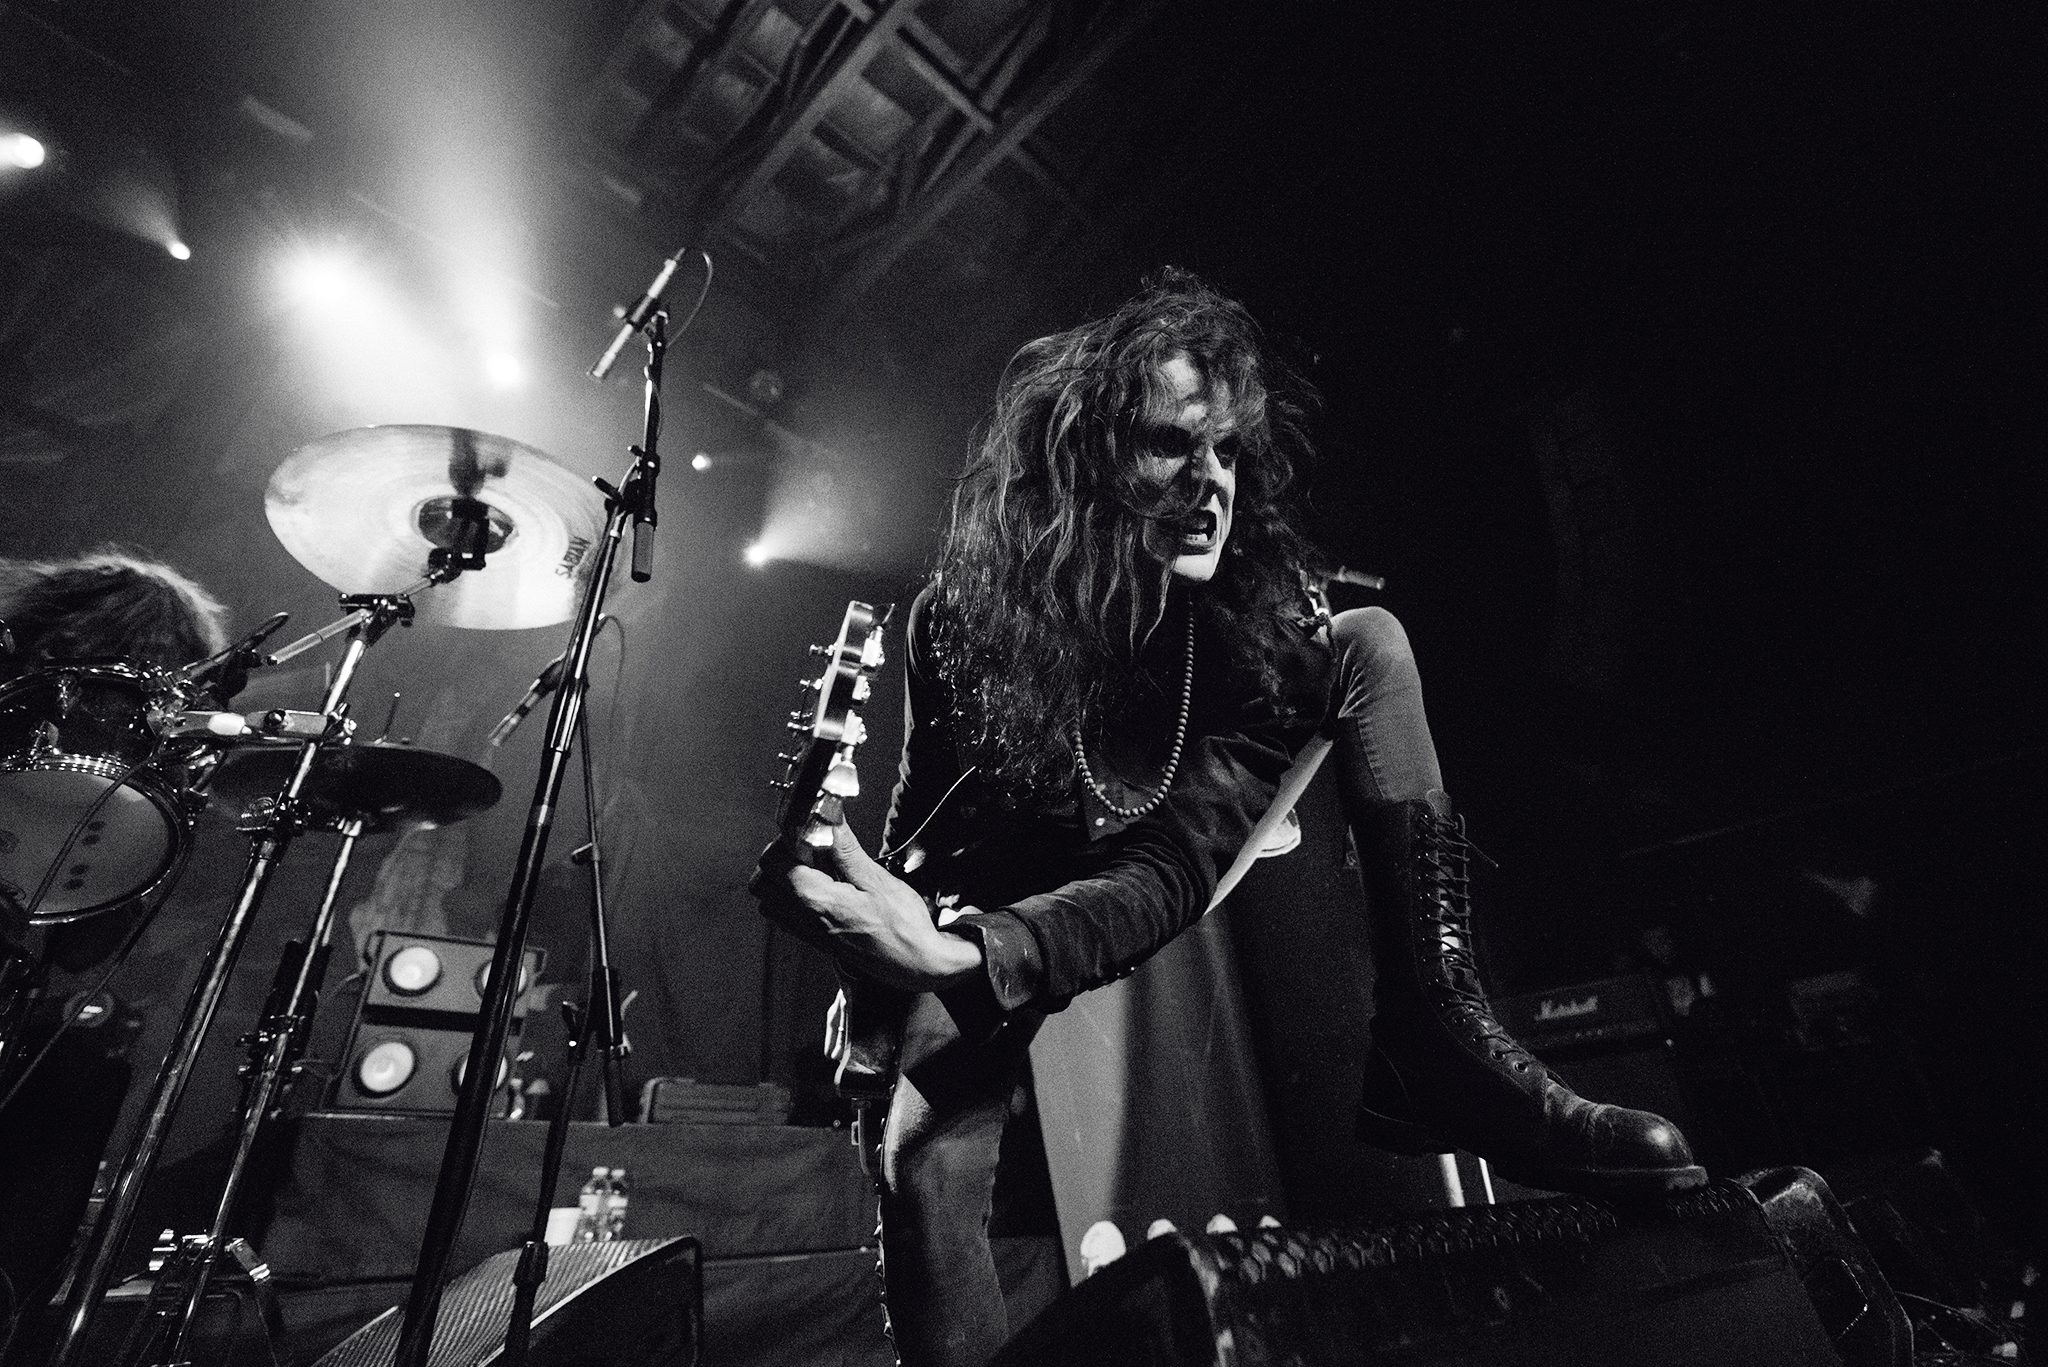 Tribulation-Emos-Concert-Photography-Katrina-Barber-2.jpg